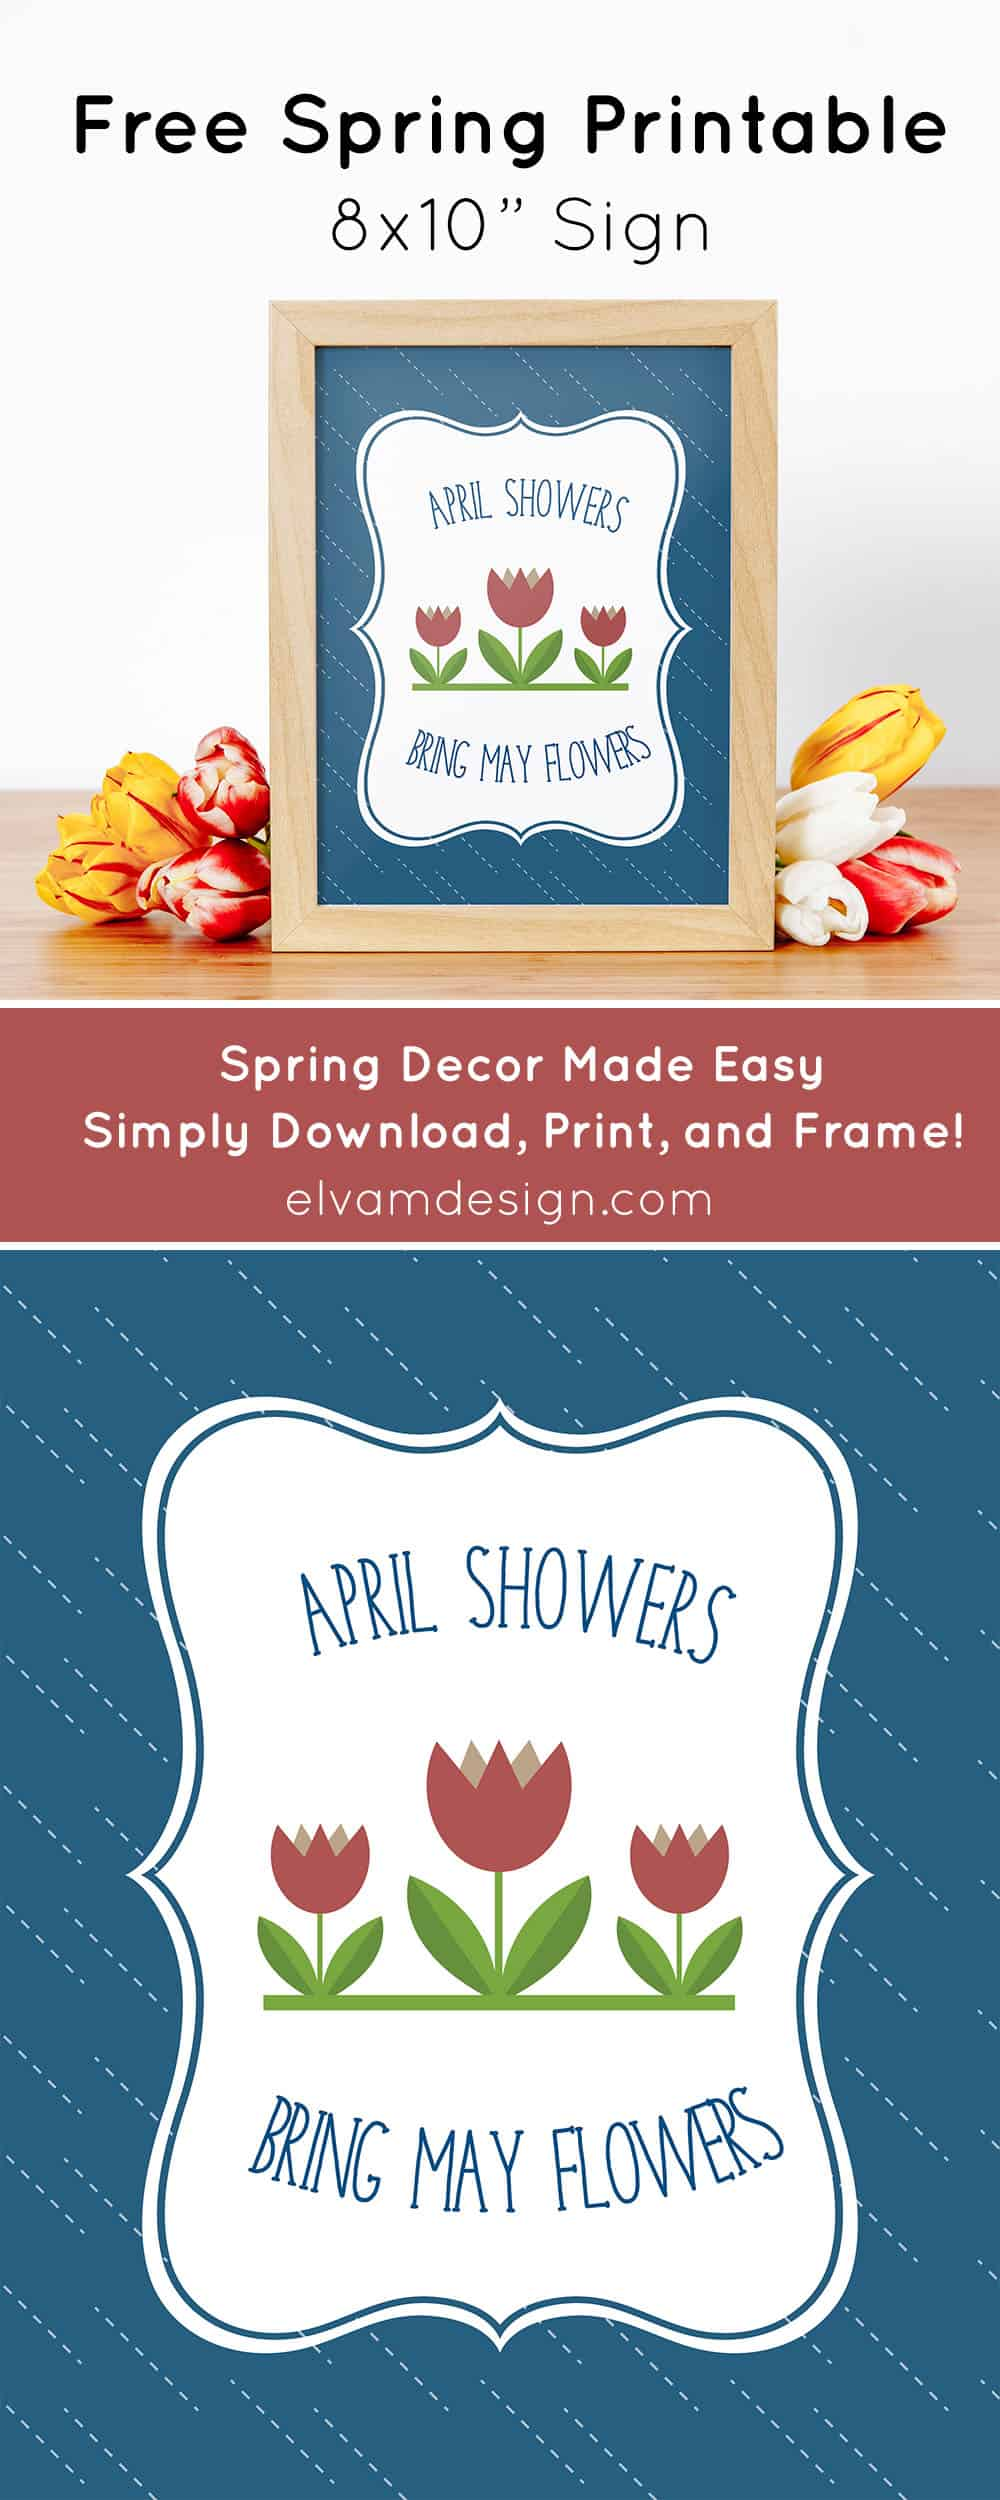 Free Spring Printable Decor from Elva M Design Studio